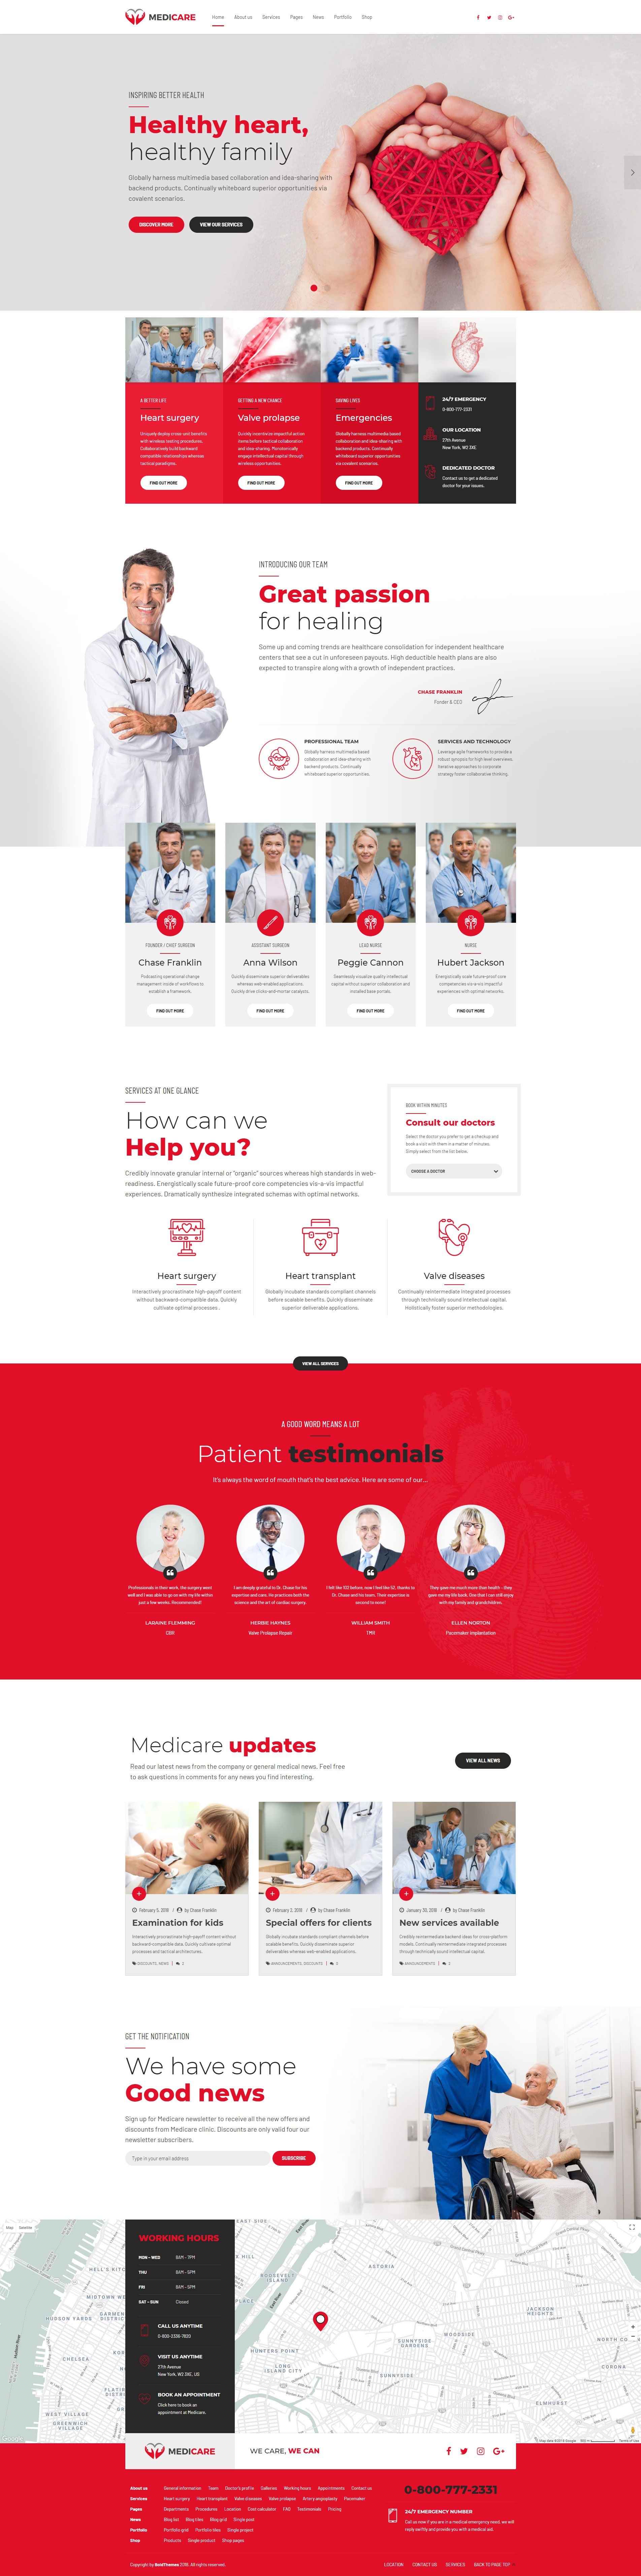 Medicare Doctor Medical Healthcare Medical Health Care Eye Care